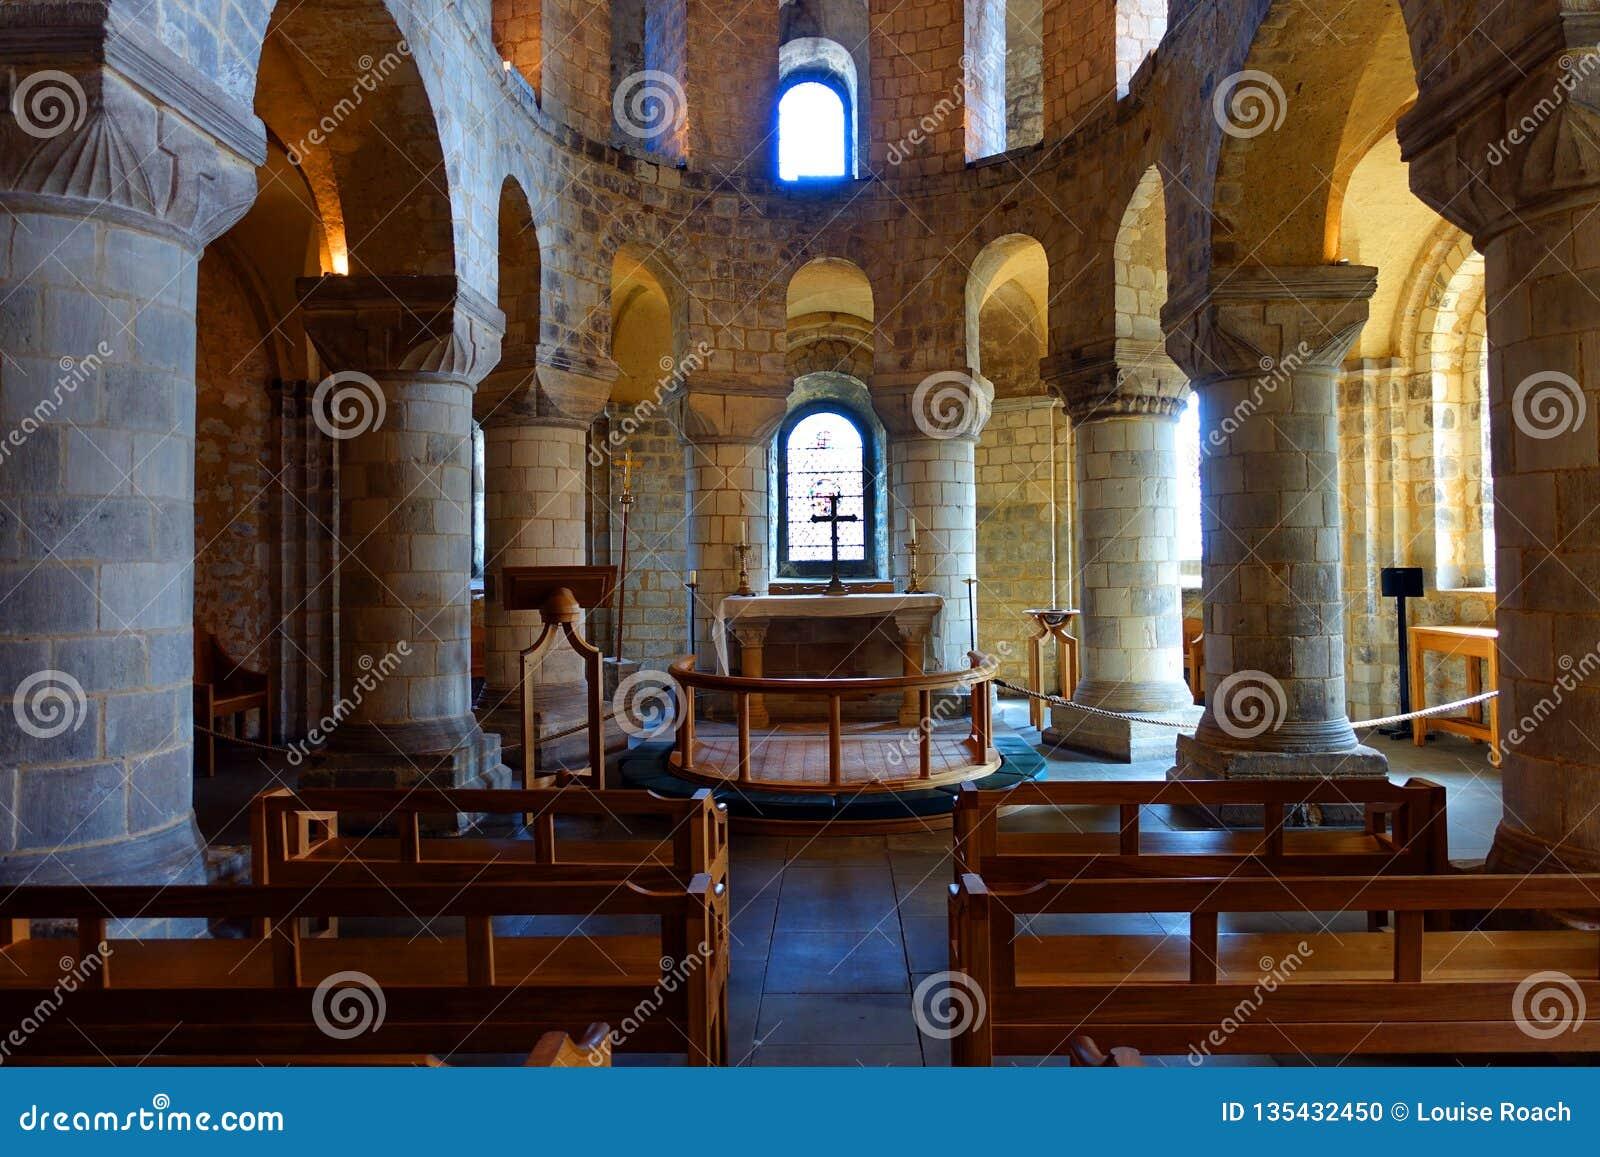 Romanesque Saint John's Chapel Tower of London